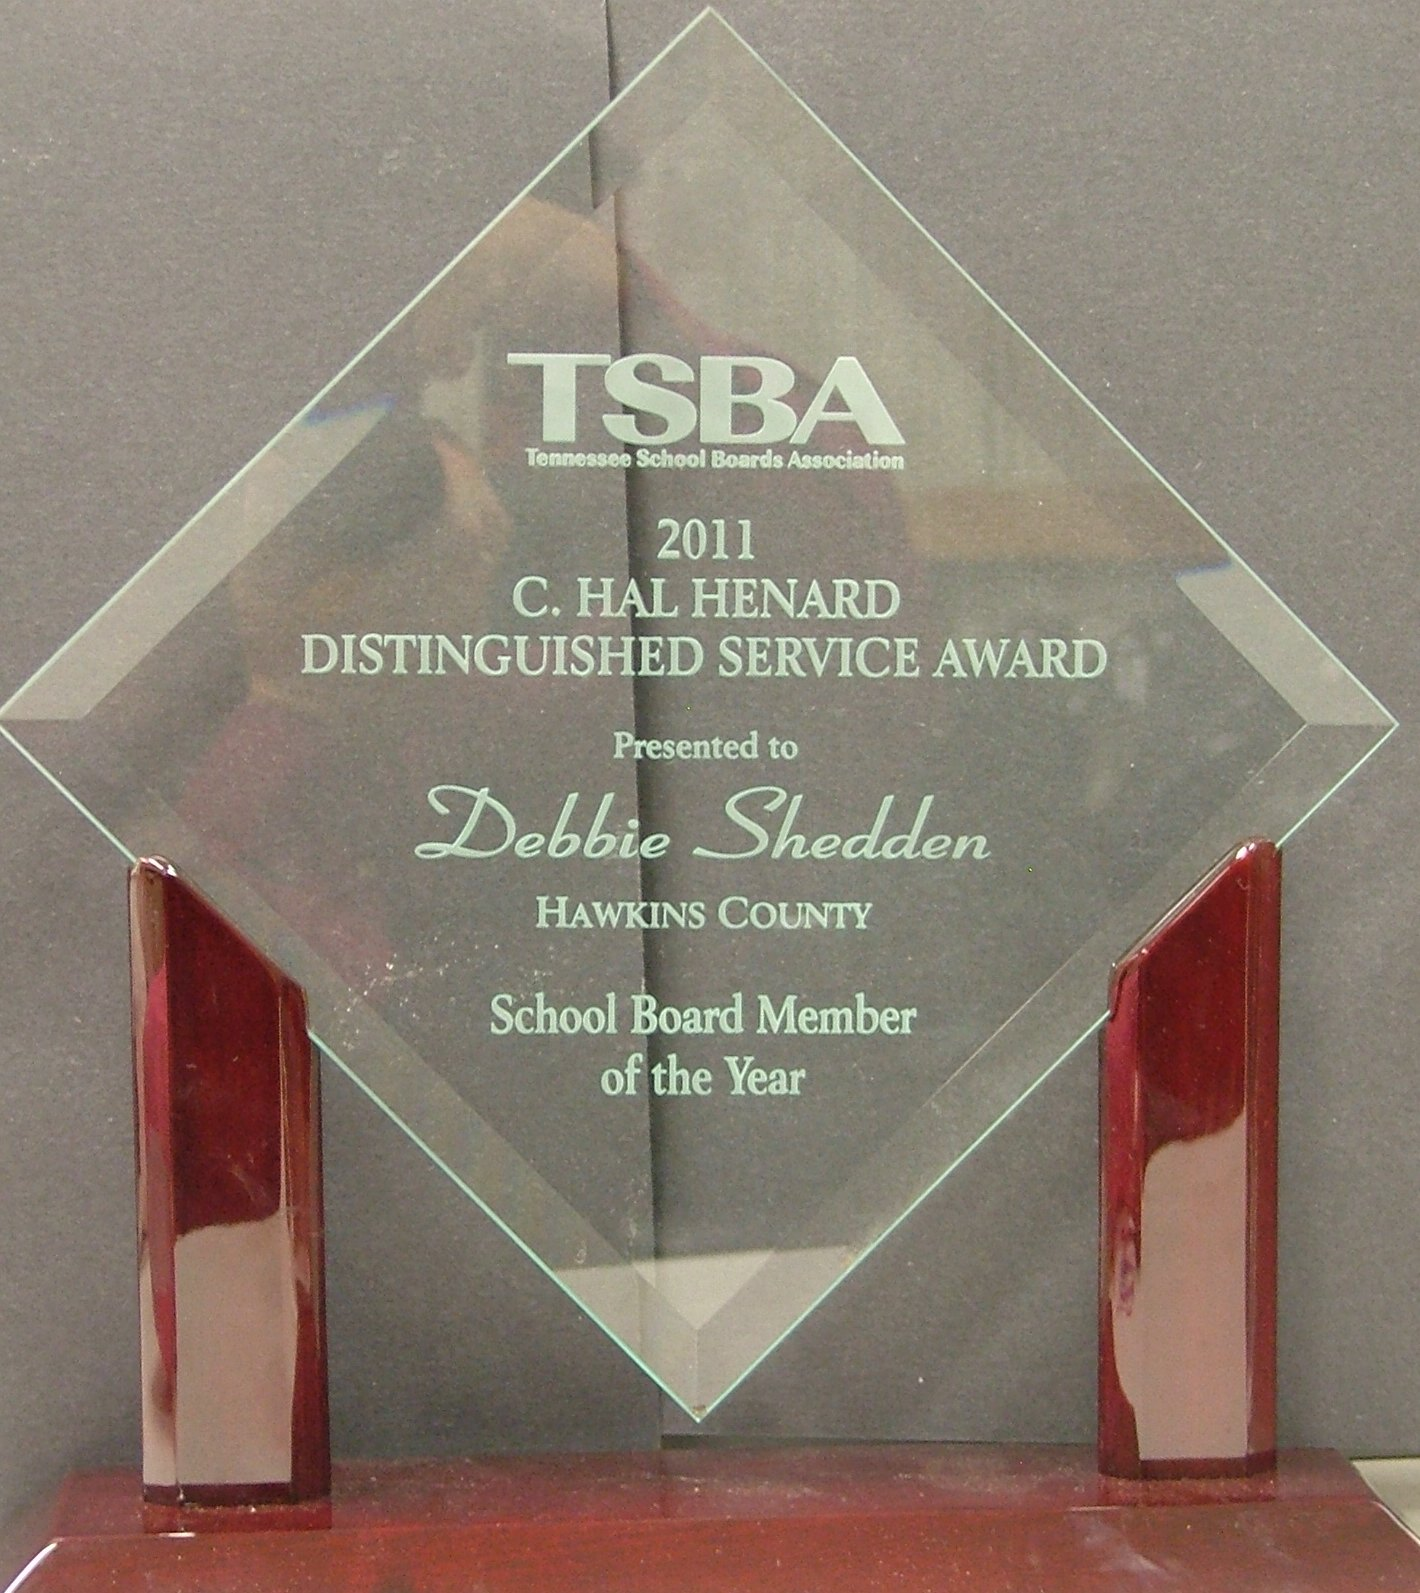 TSBA C. Hal Henard Distinguished Service Award